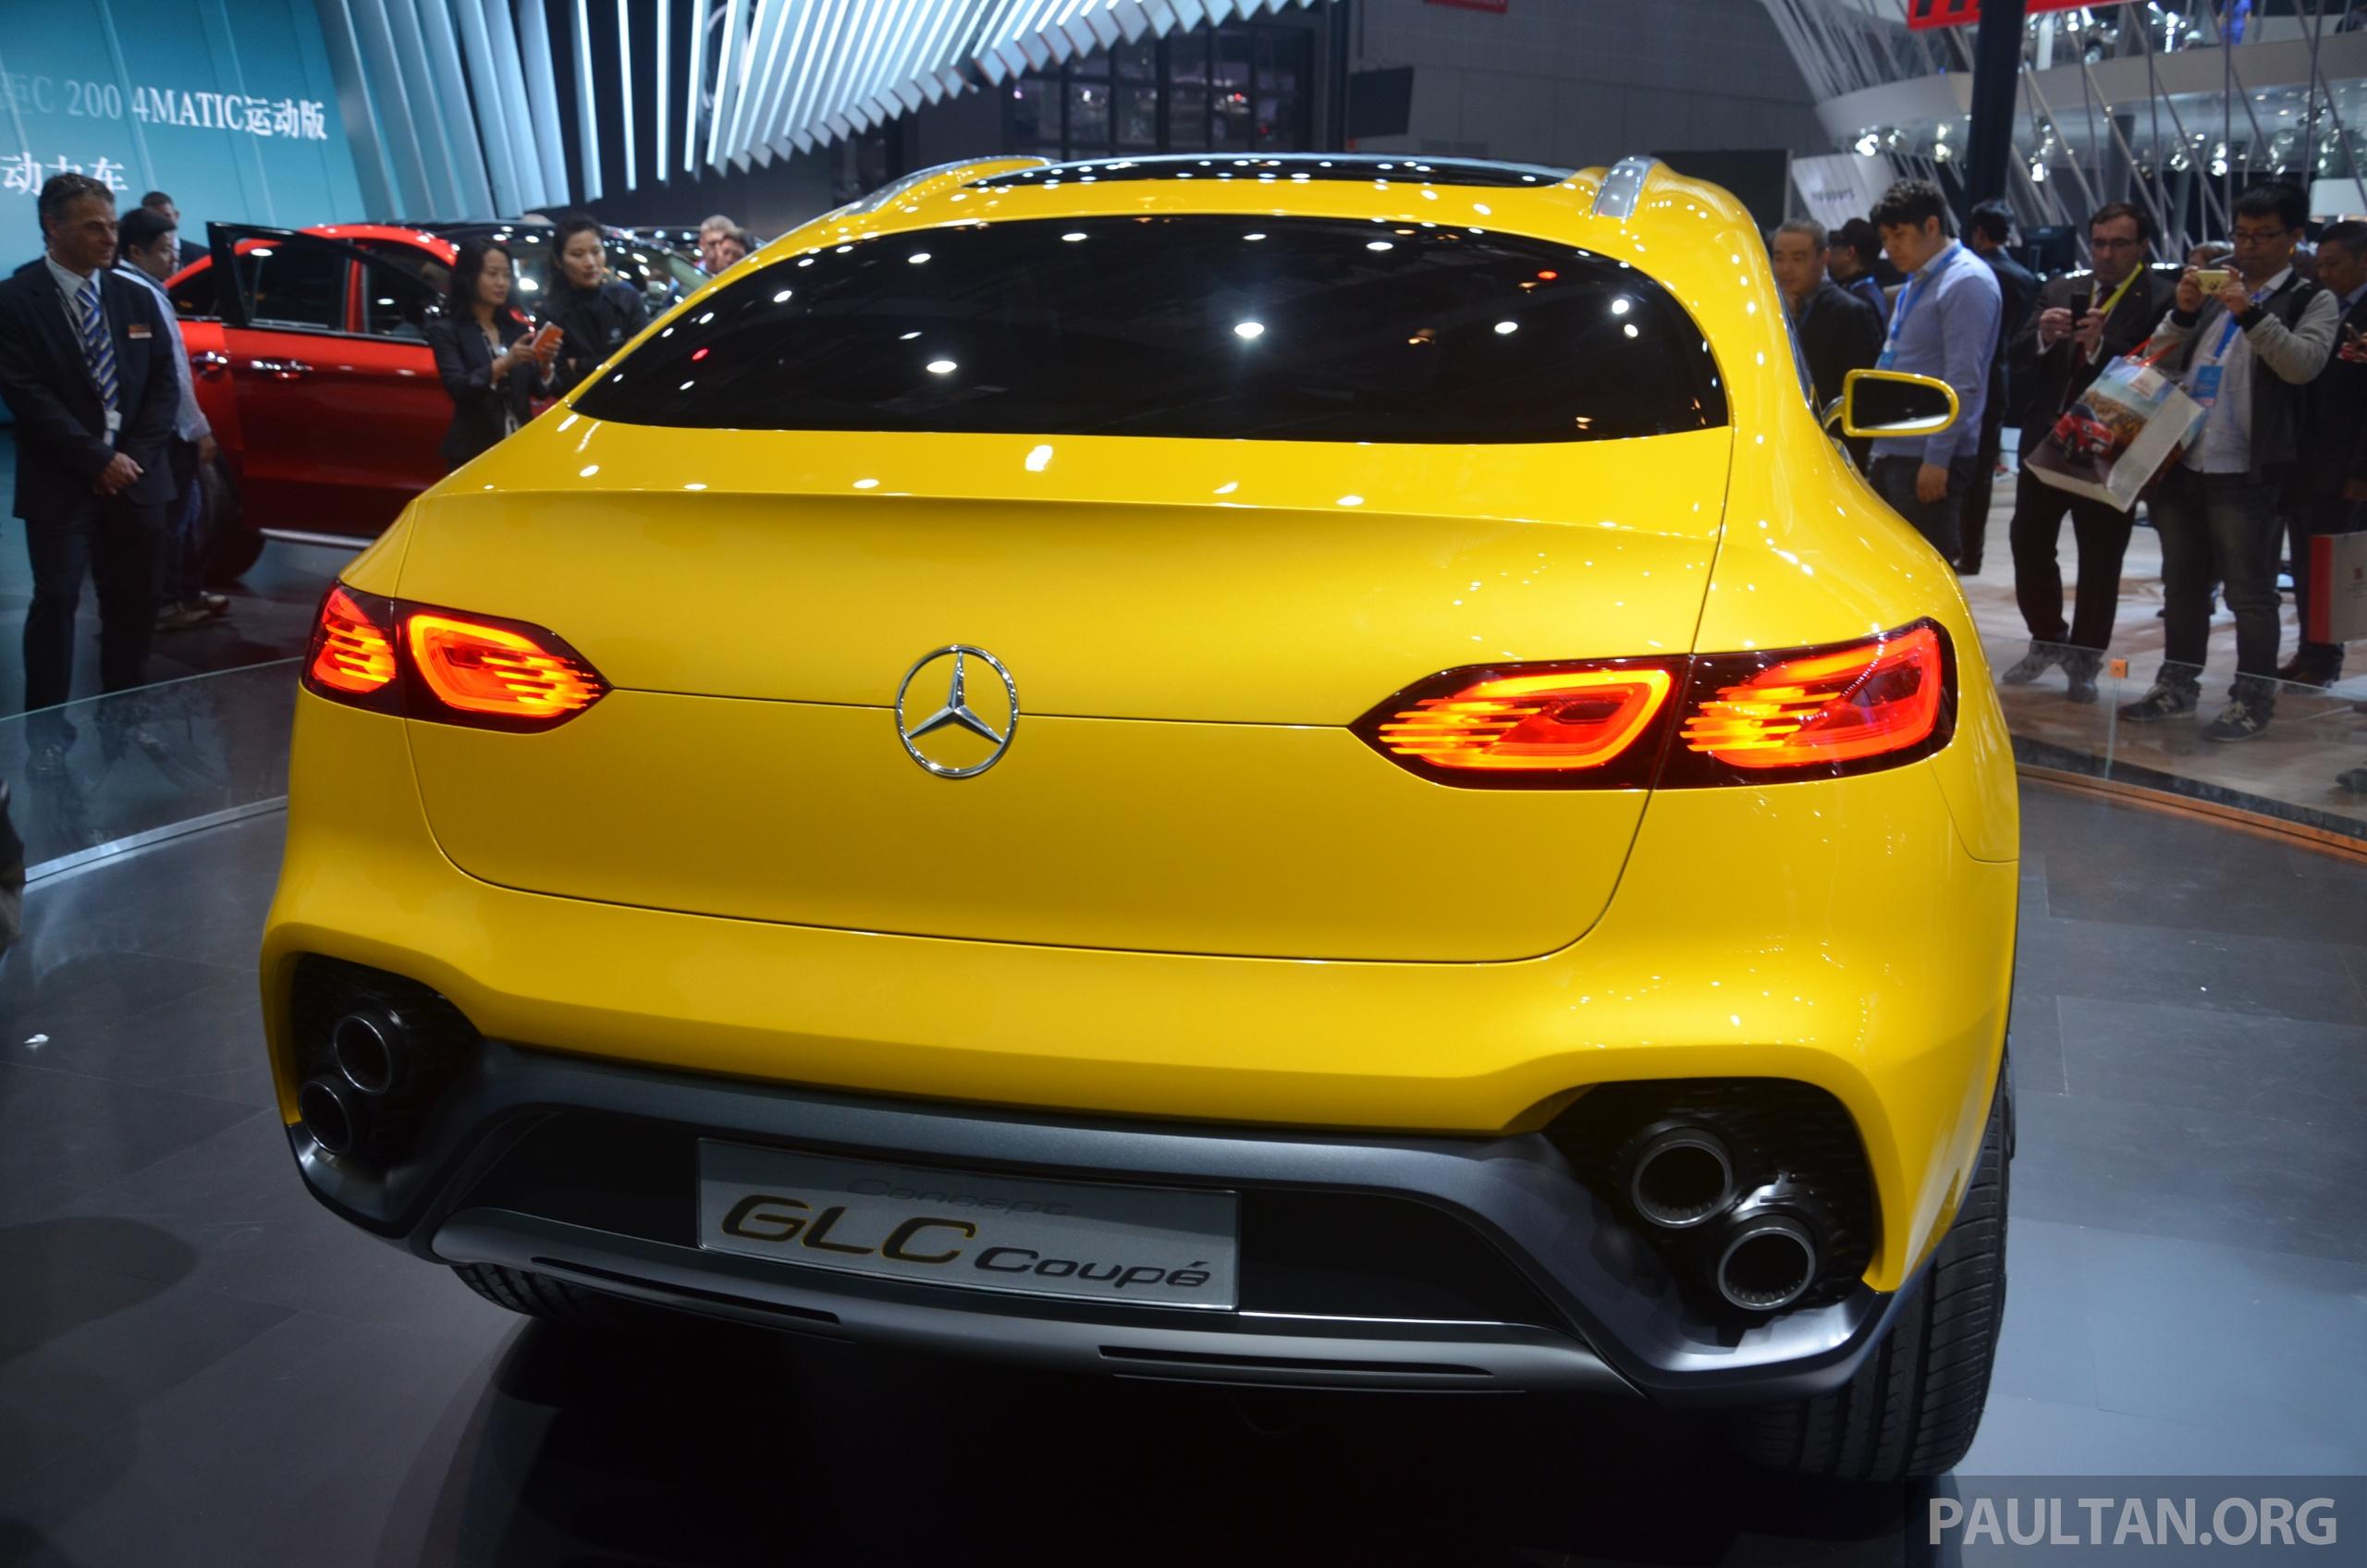 https://s2.paultan.org/image/2015/04/mercedes-benz-glc-coupe-concept-shanghai-1219.jpg